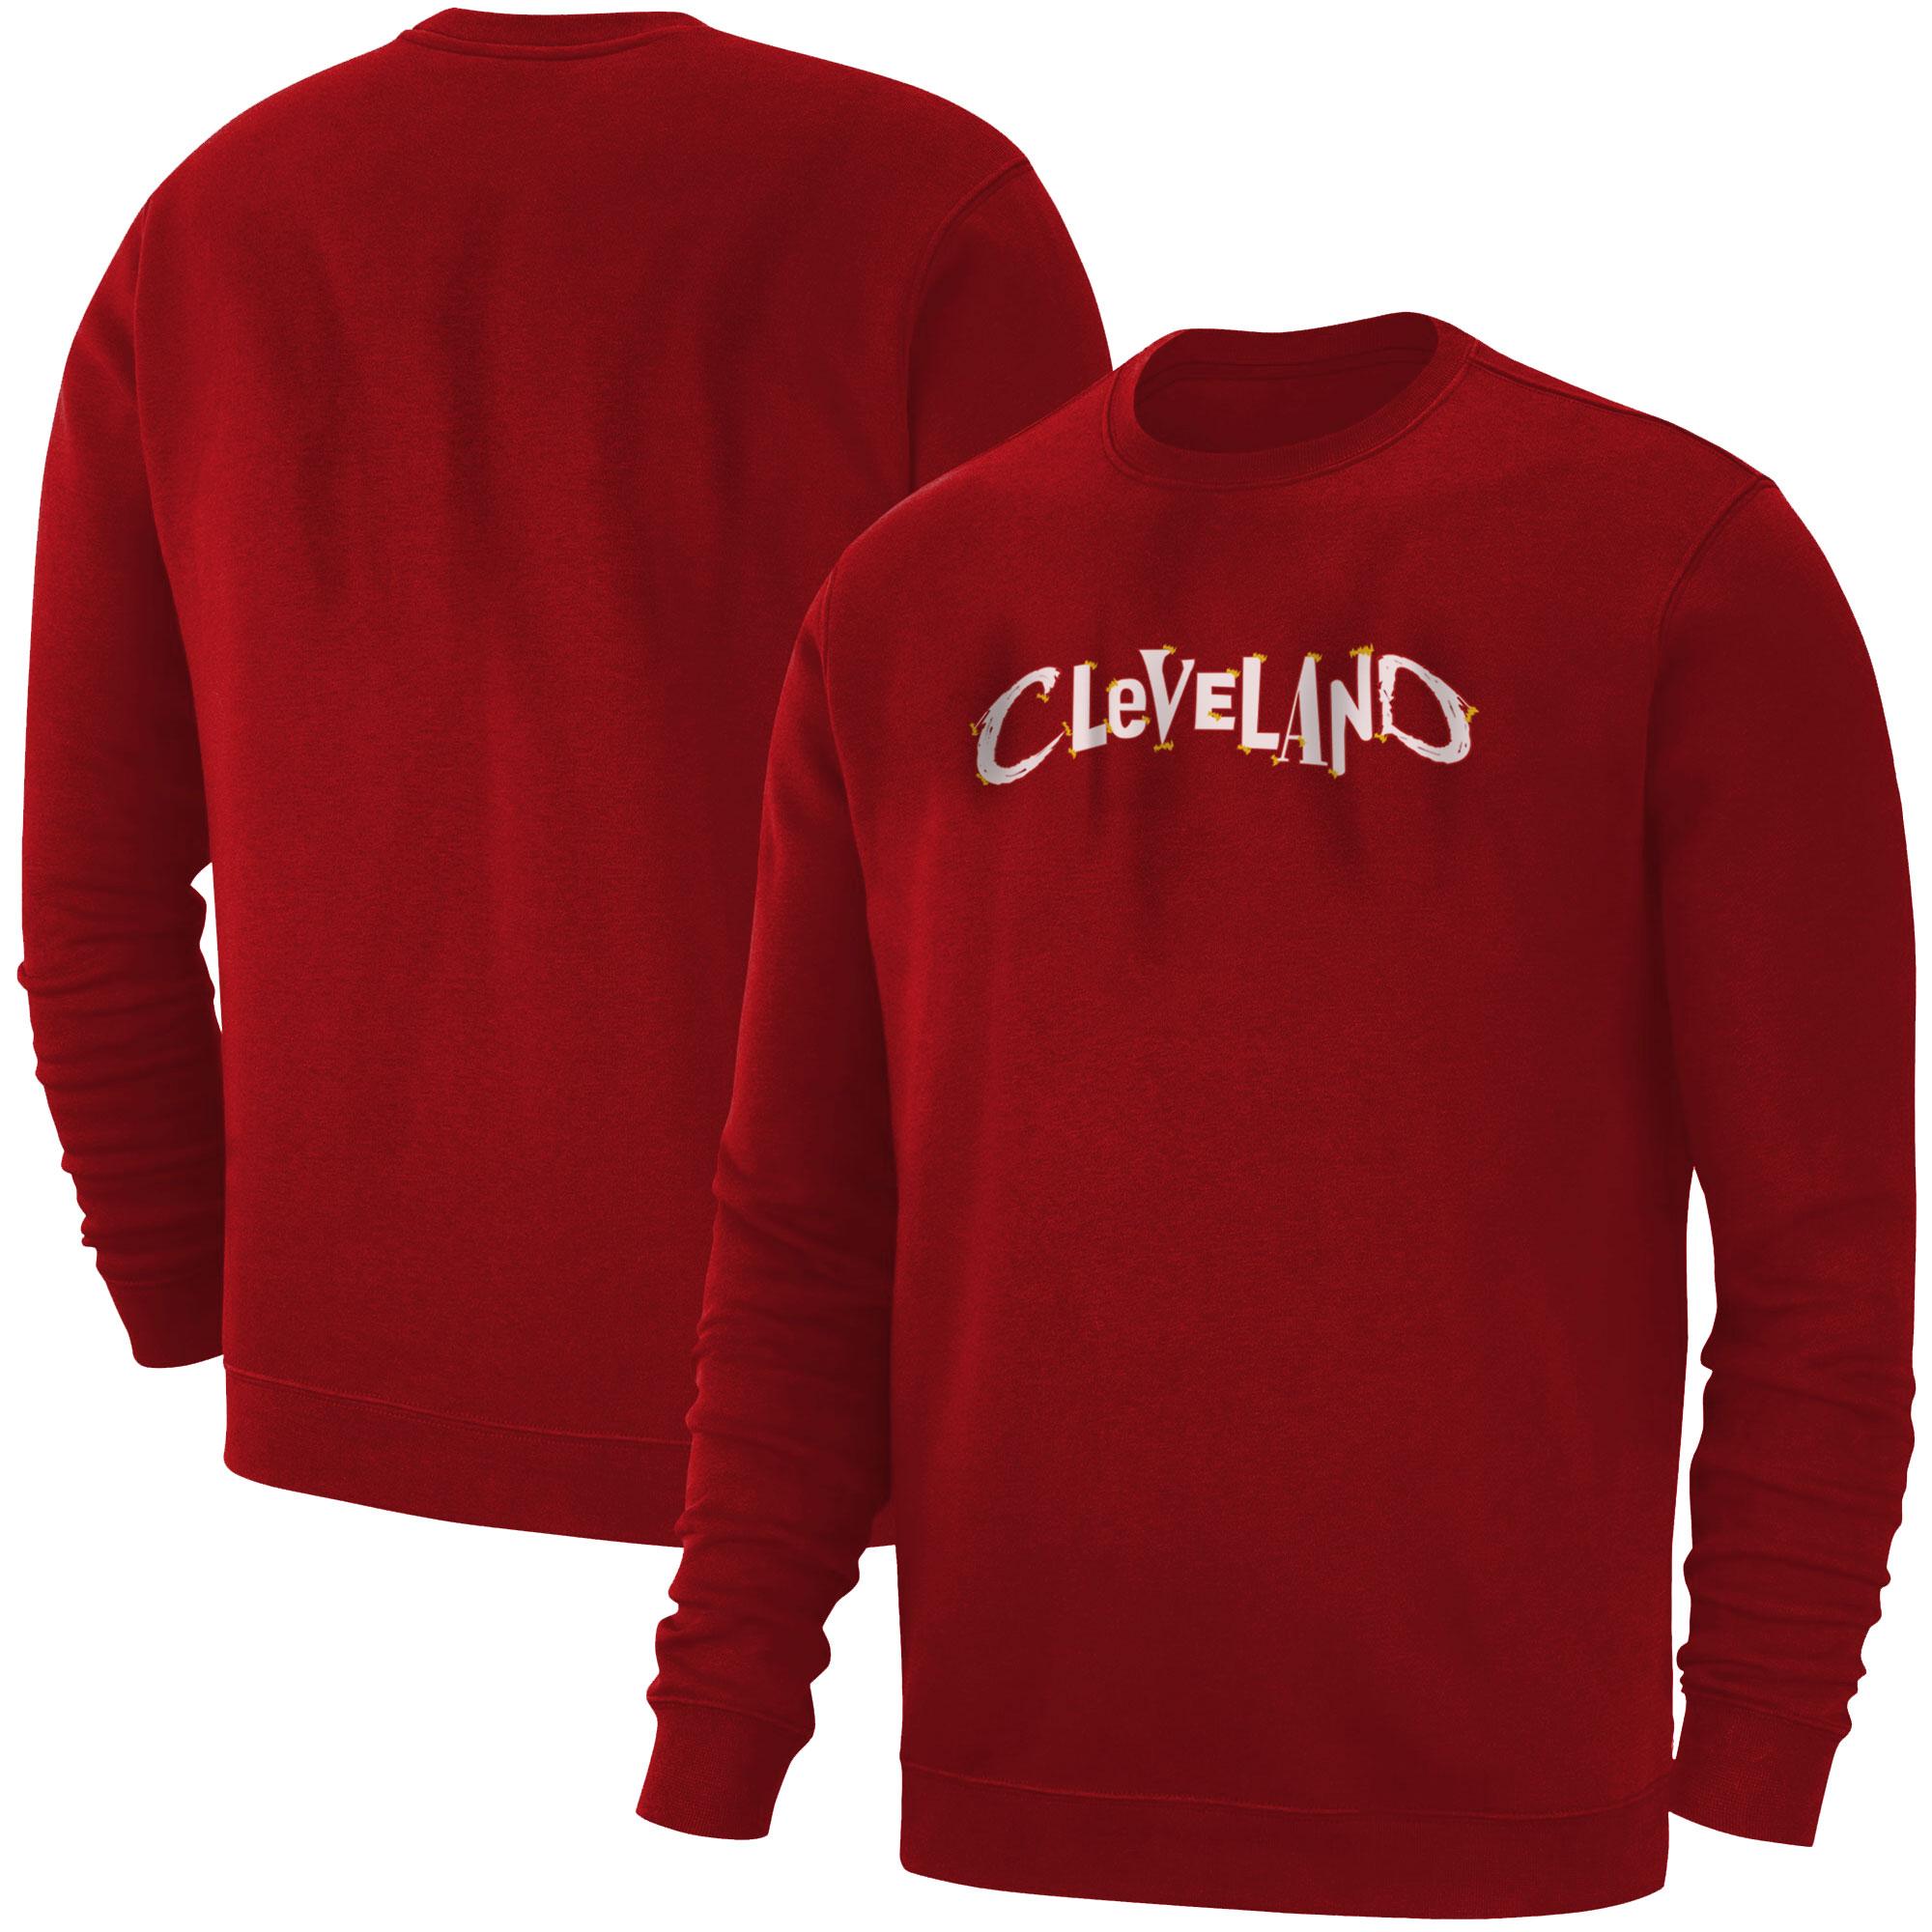 Cleveland City Edition Basic (BSC-BLC-485-NBA-CLEVELAND-CITY)